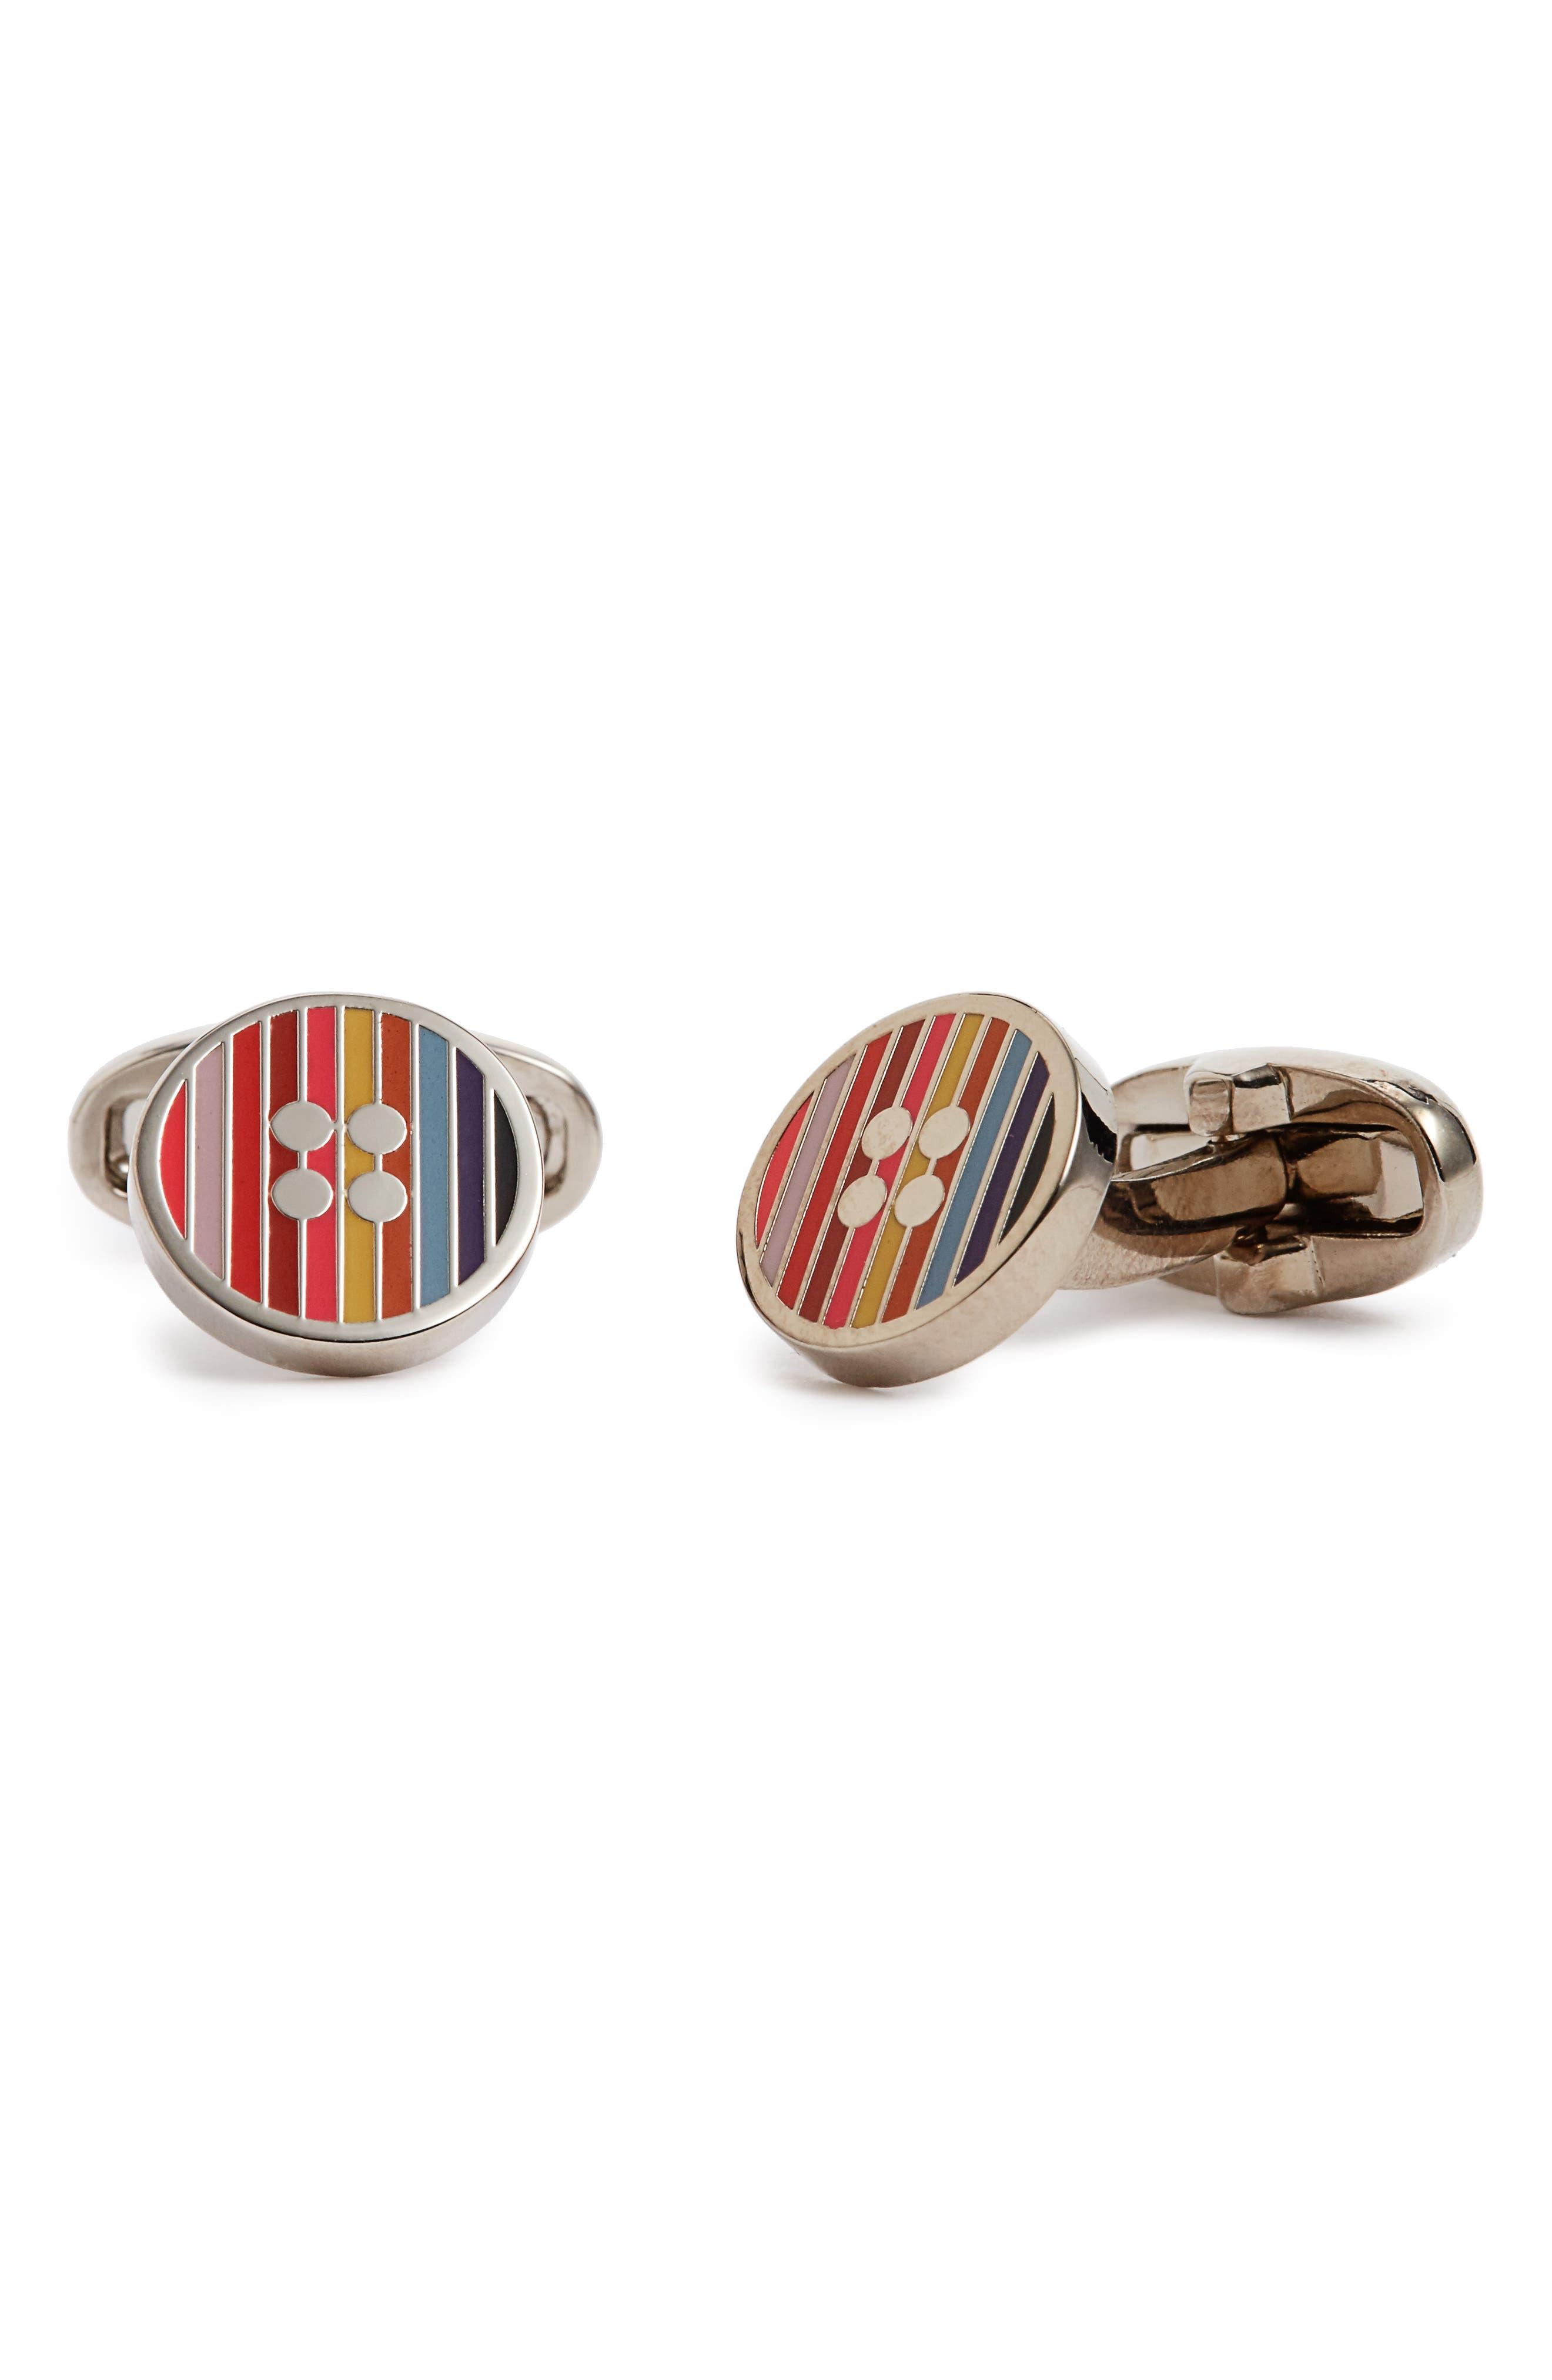 Main Image - Paul Smith Stripe Button Cuff Links